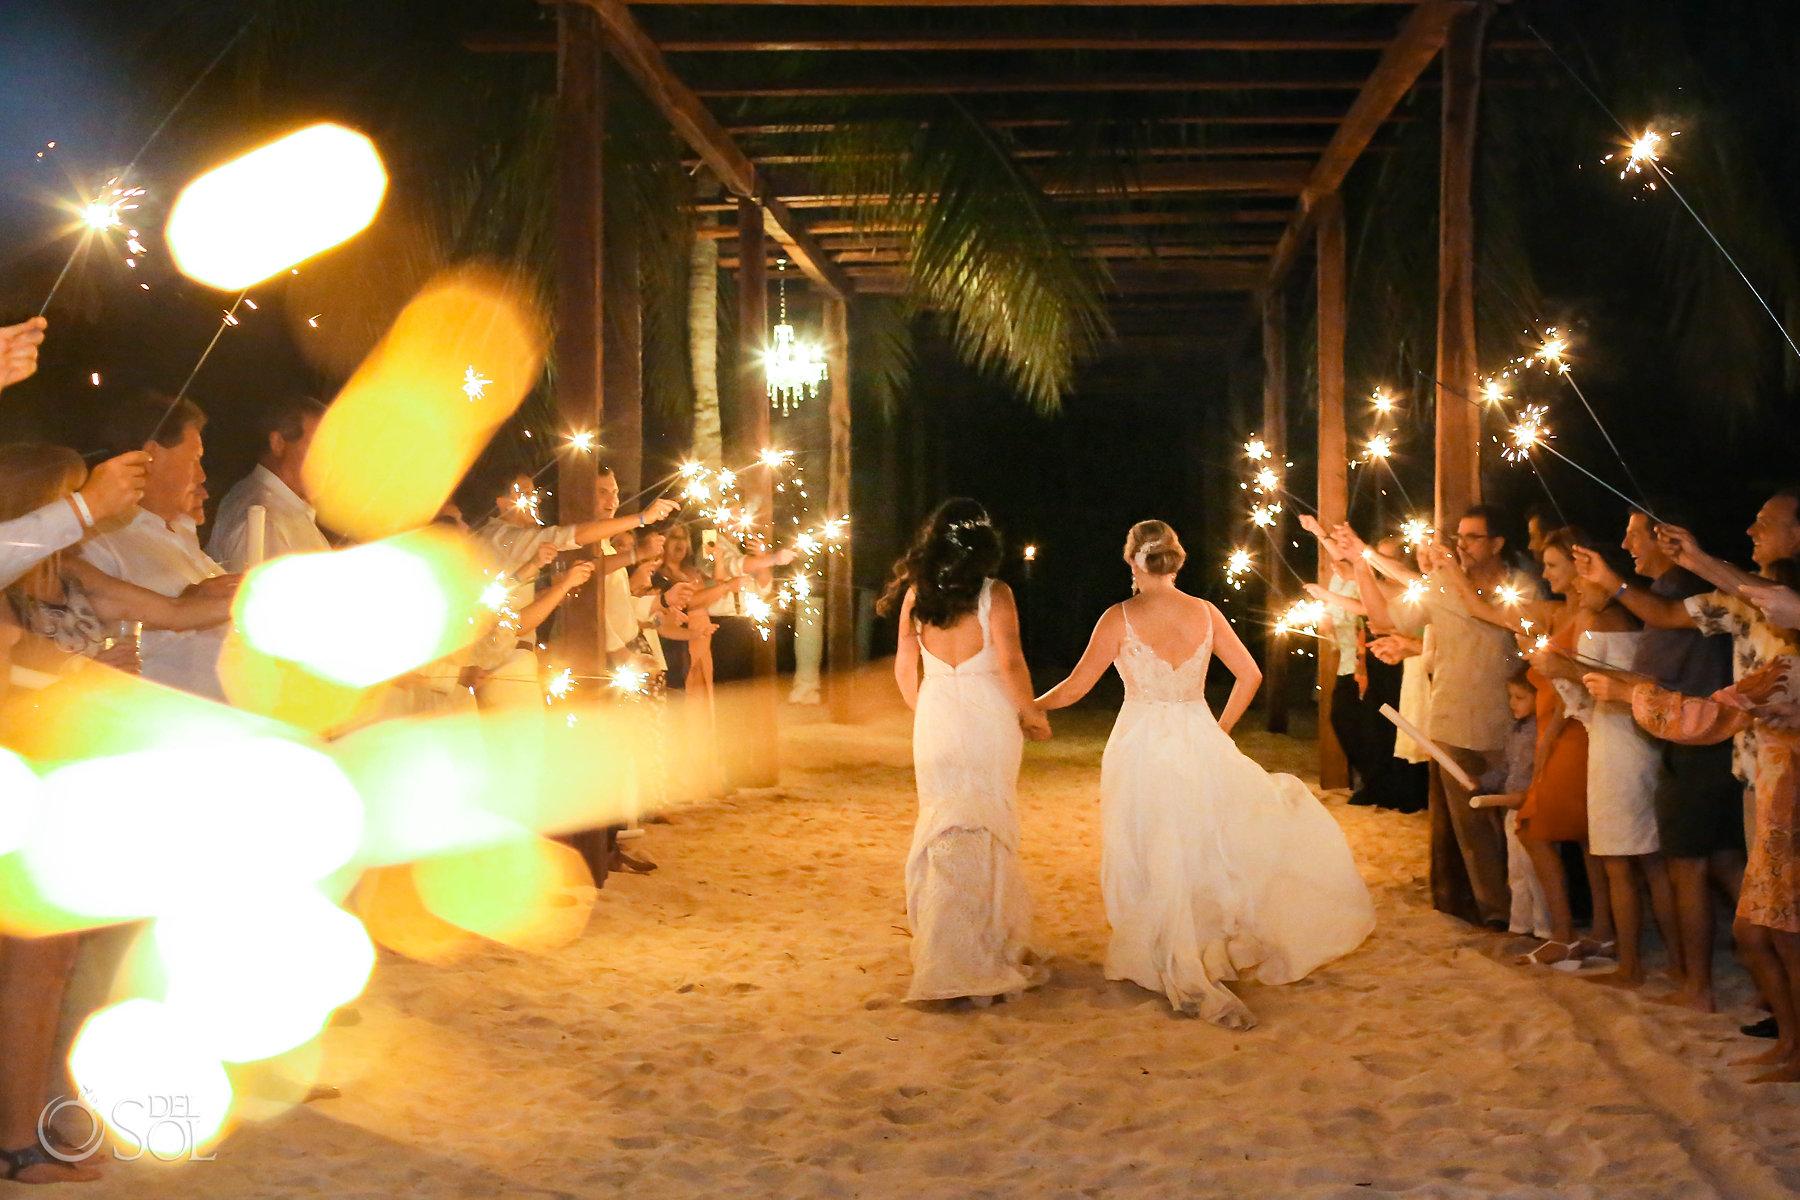 LGBT Wedding Sparklers lesbian brides running at Isla Mujeres reception Zama Beach